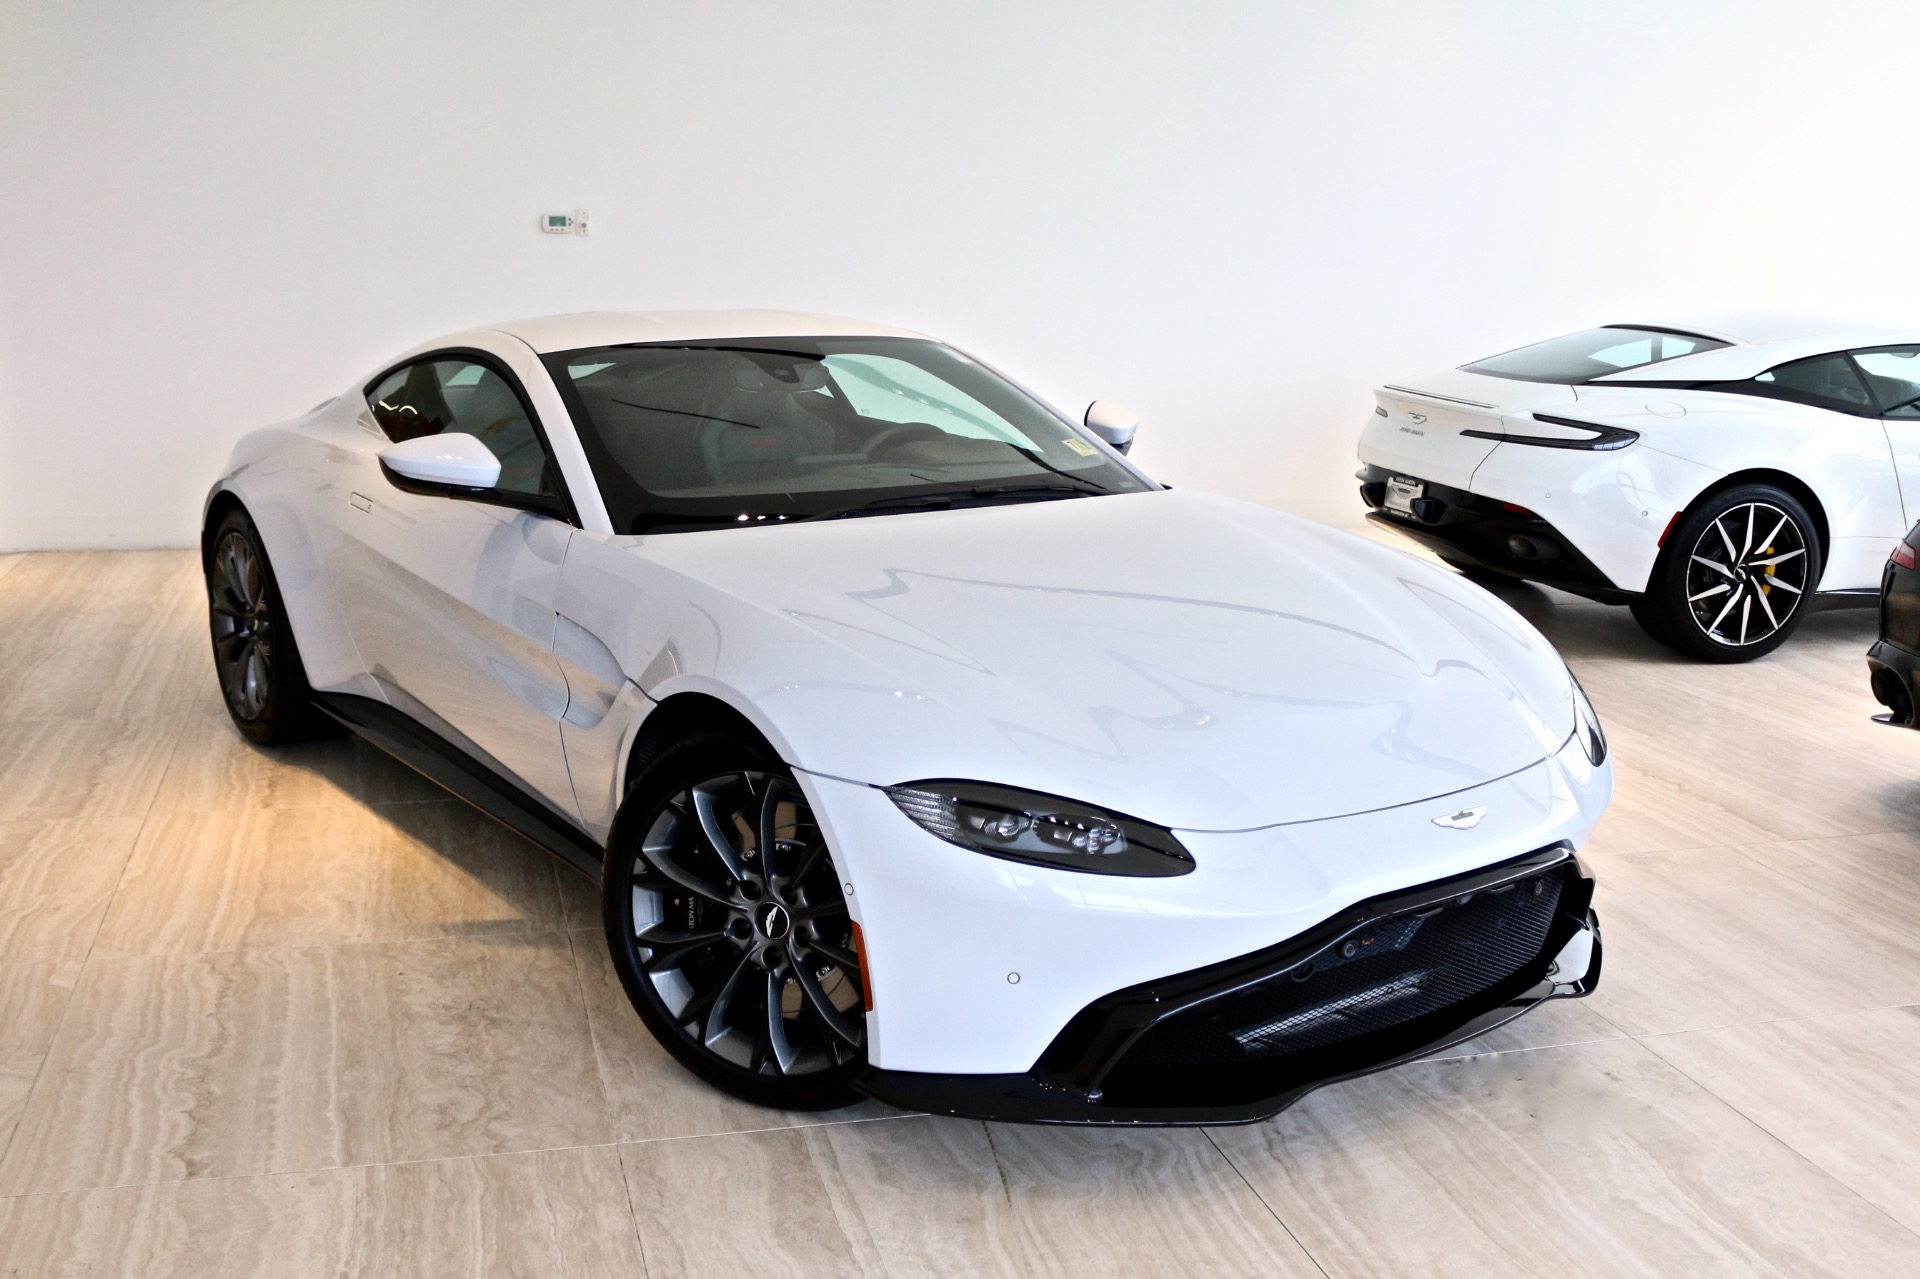 2019 Aston Martin Vantage Stock 9nn00180 For Sale Near Vienna Va Va Aston Martin Dealer For Sale In Vienna Va 9nn00180 Exclusive Automotive Group